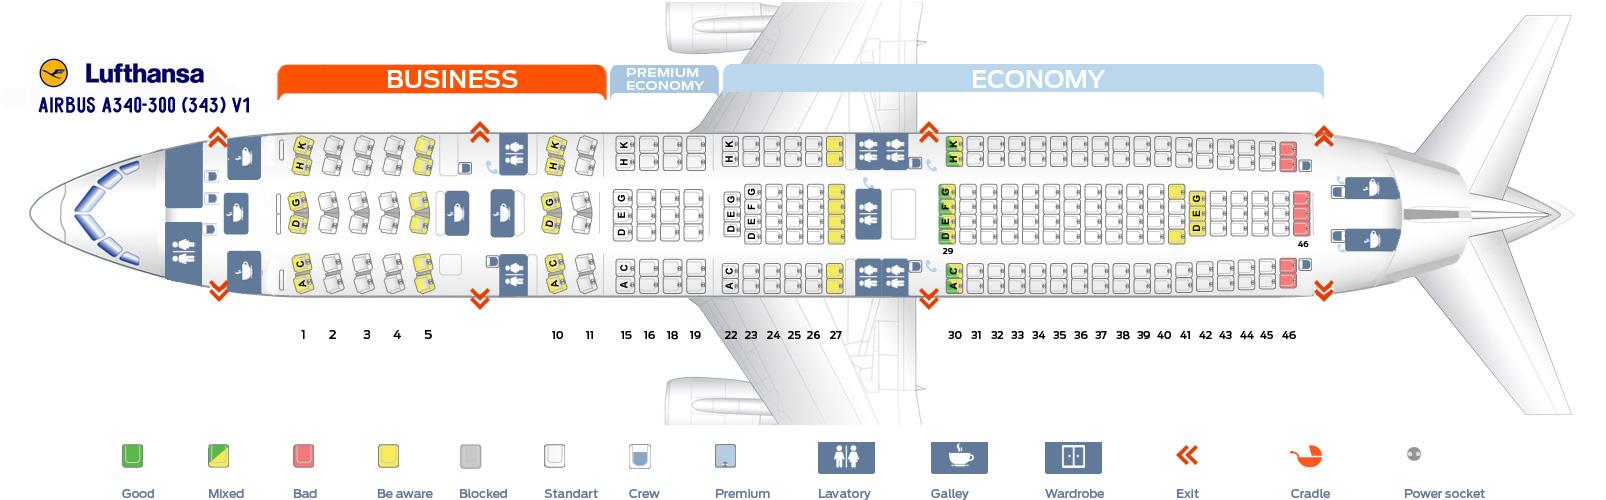 Seat_map_Lufthansa_Airbus_A340-300_v1